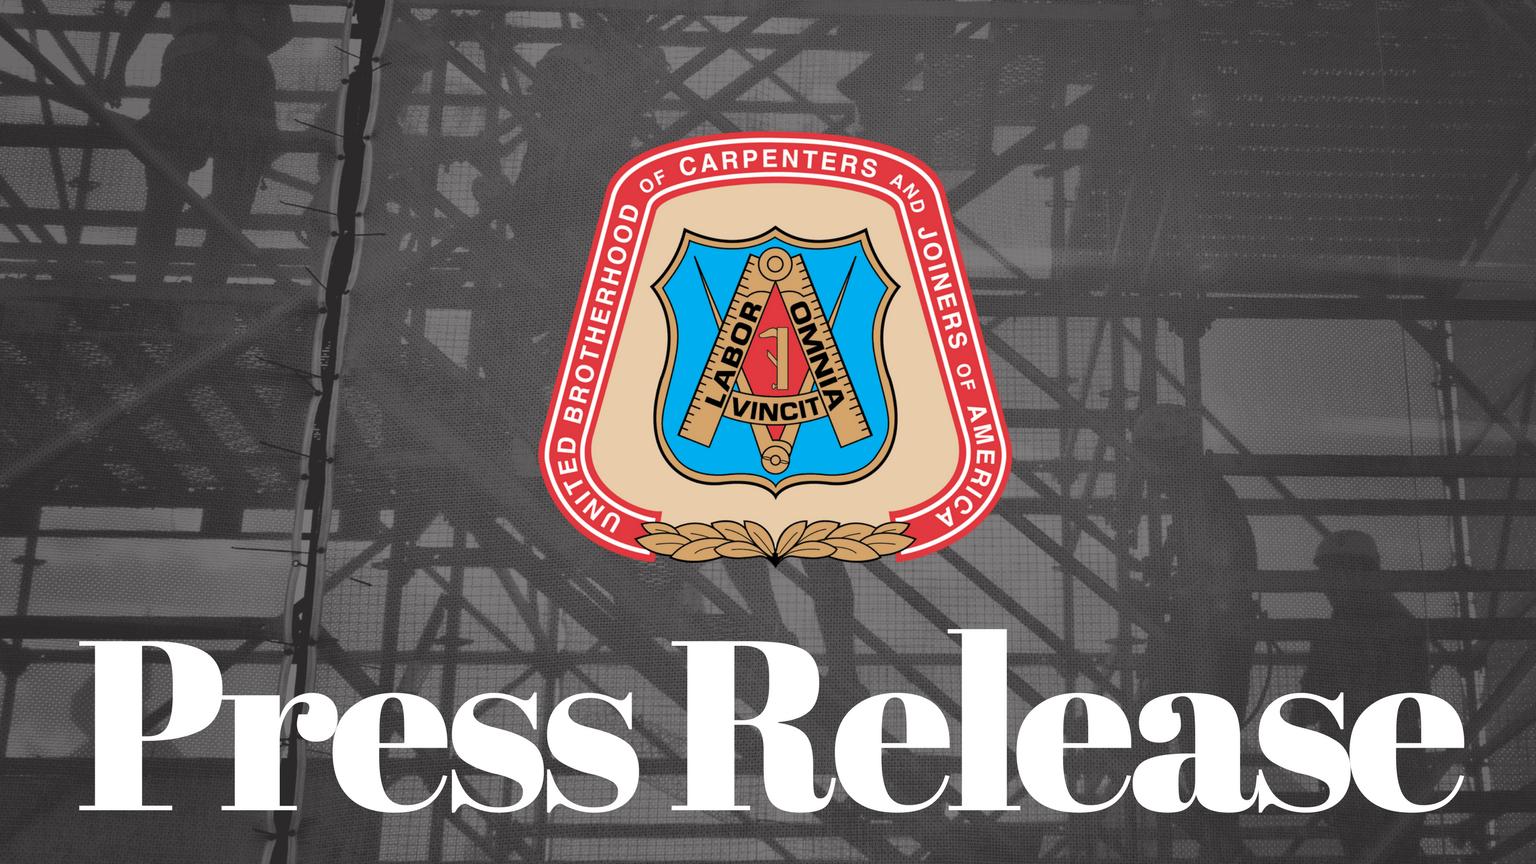 press_release_thumb.png